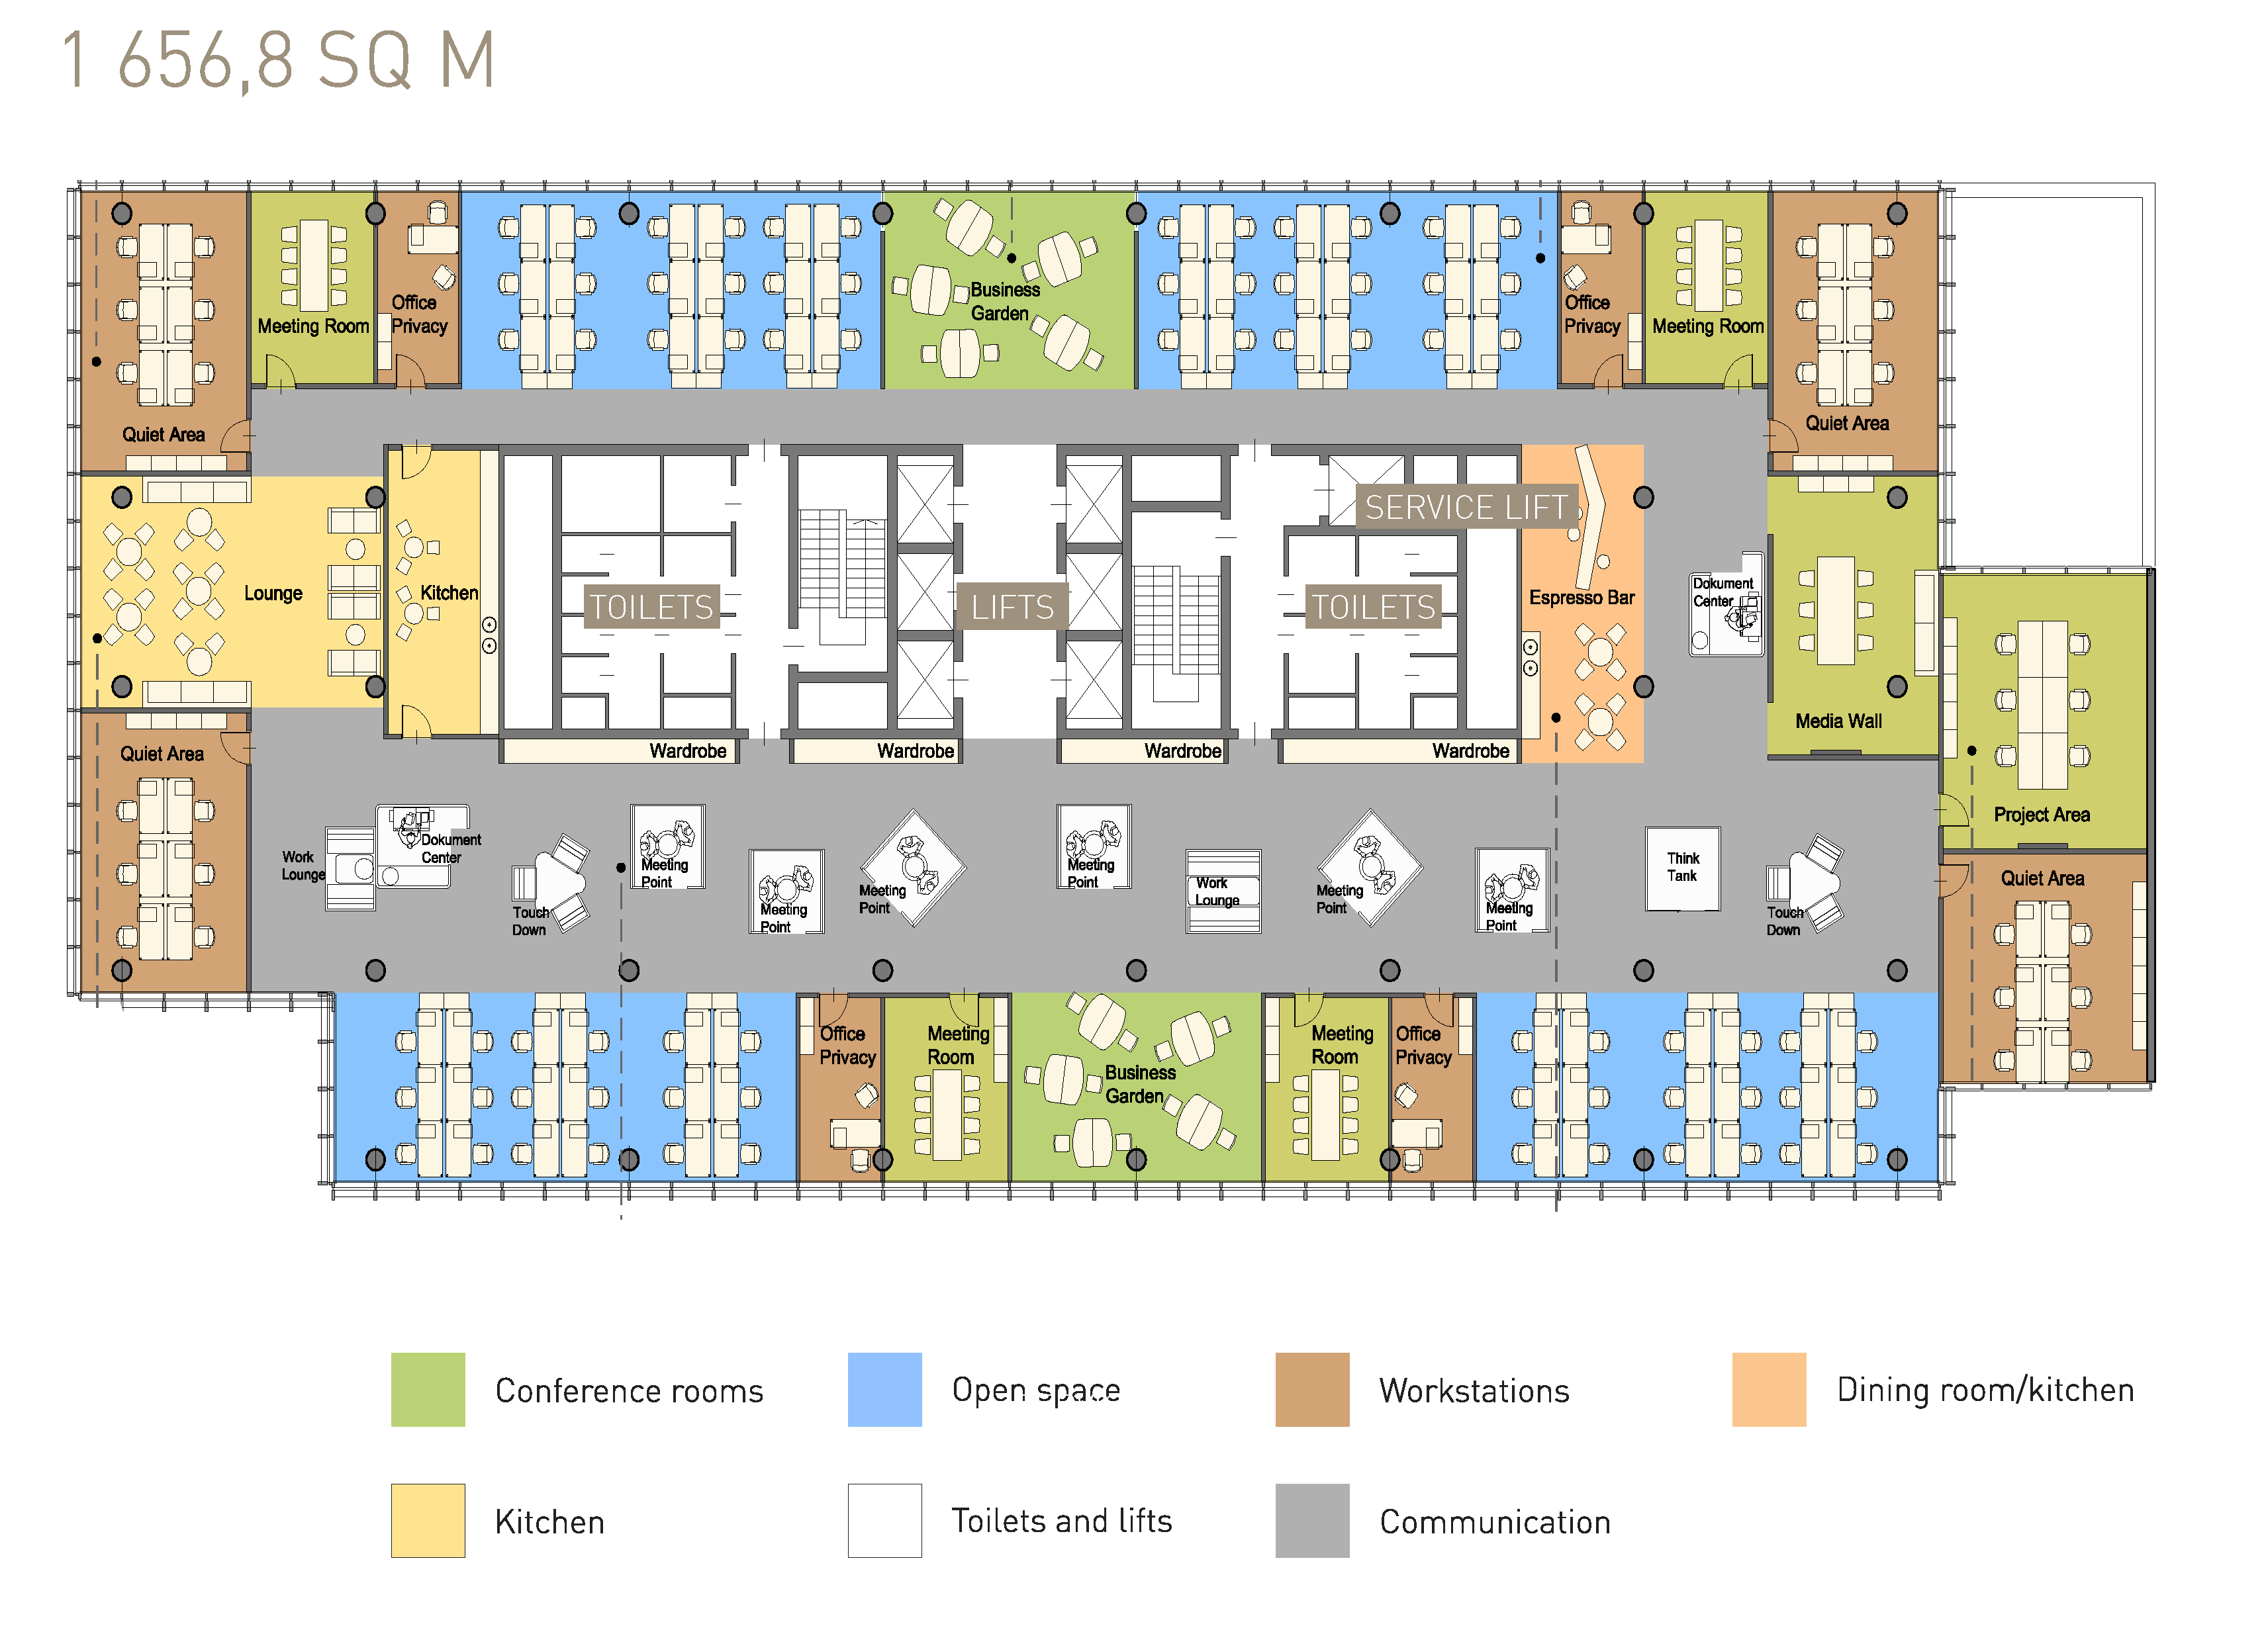 FLOORS 4-7